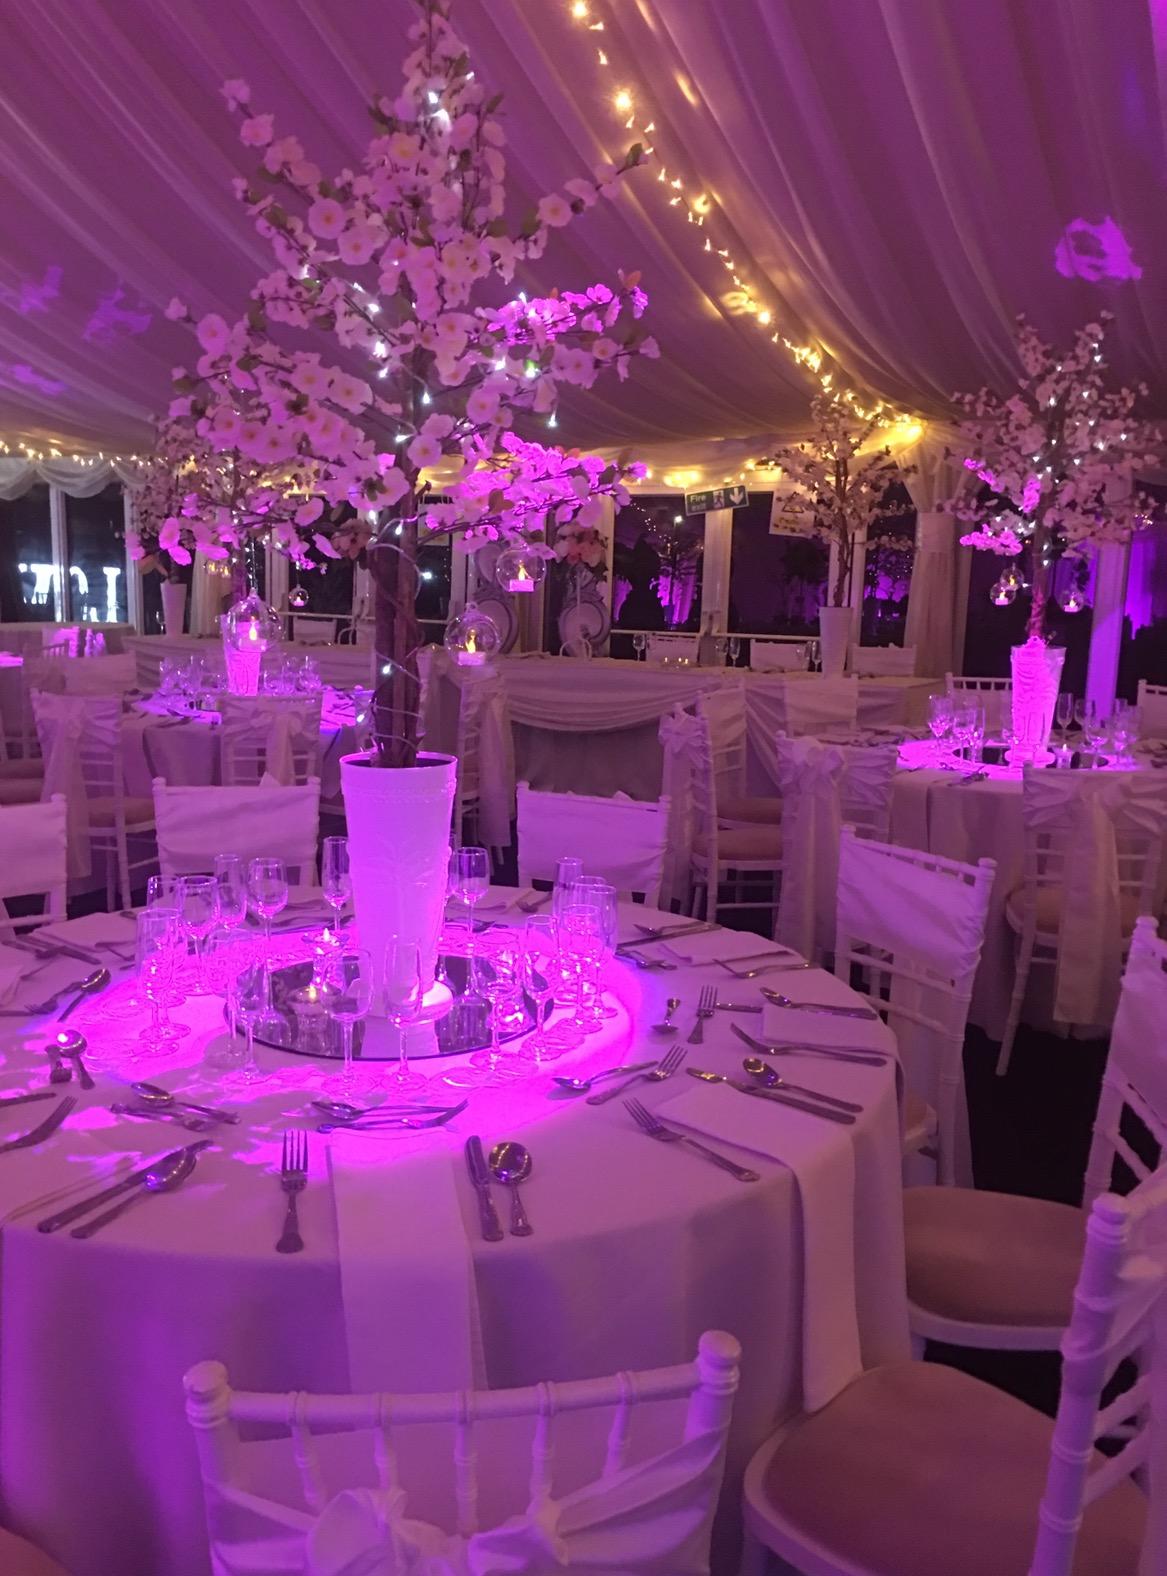 Wedding Venues Liverpool - Weddings On The Waterfront - Aigburth, Liverpool